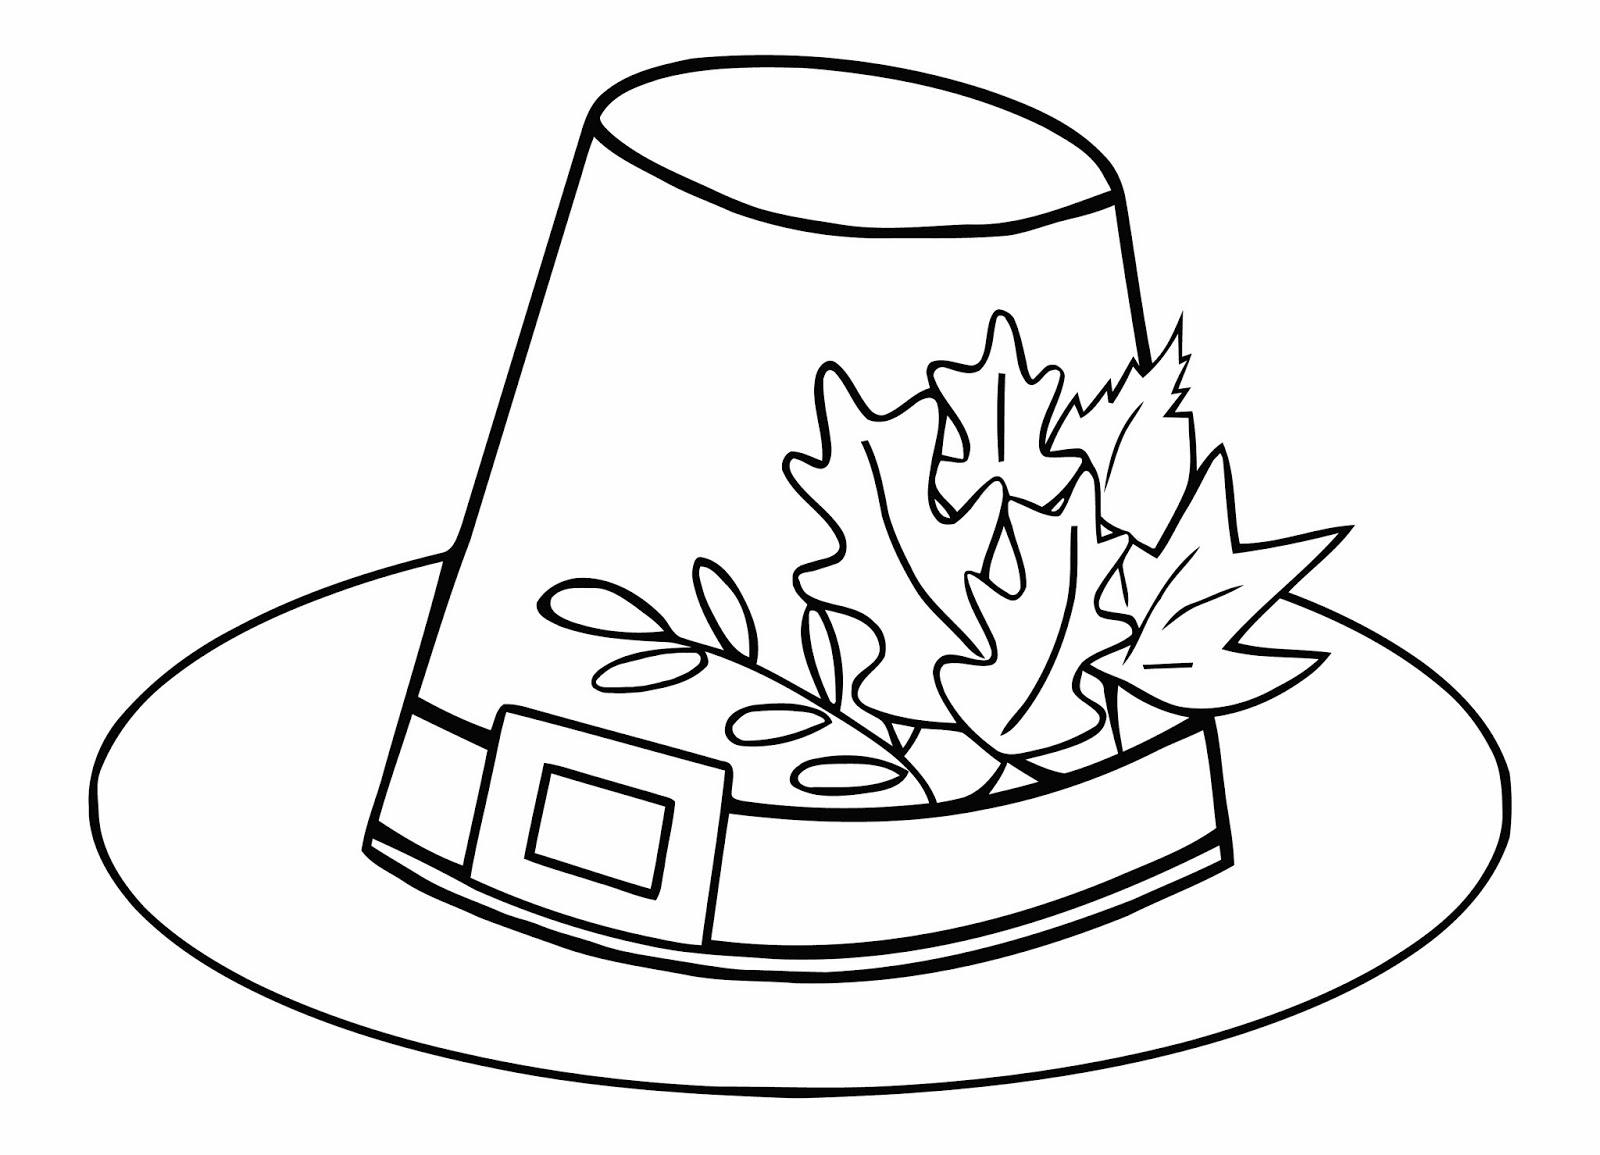 1600x1155 Pligrit Thanksgiving Hat Free Coloring Page Holidays, Kids